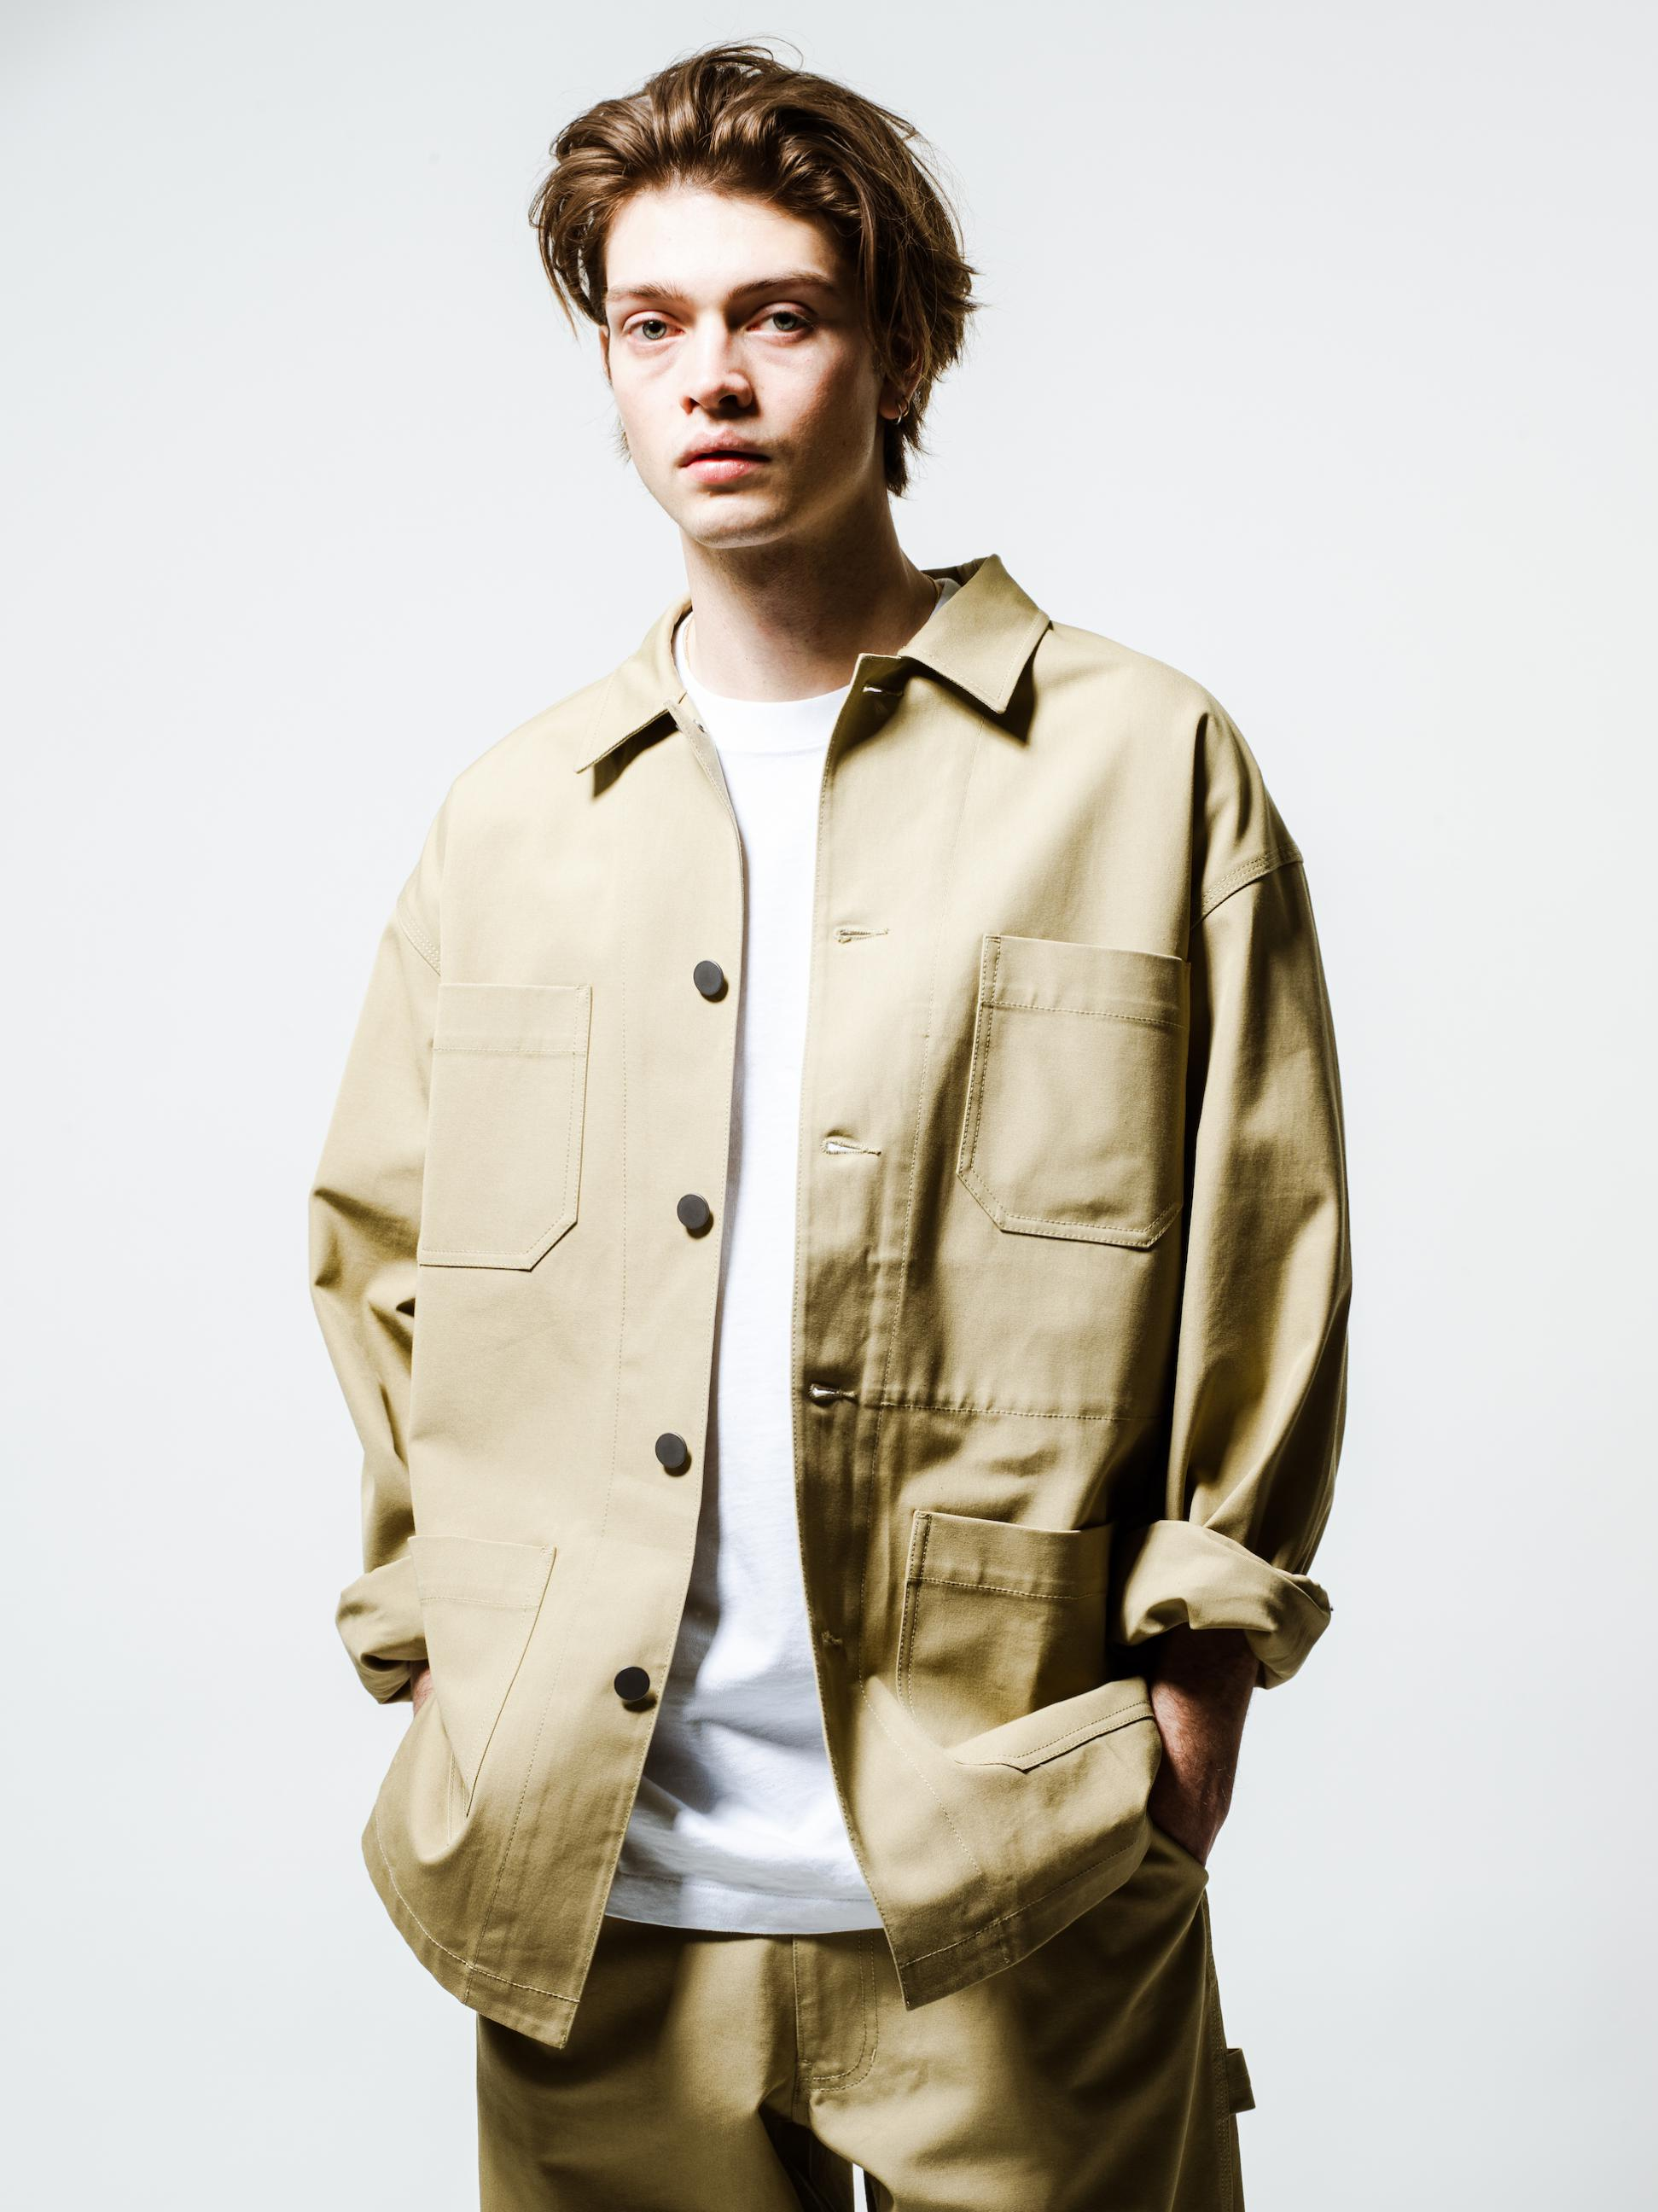 5) Jacket ¥30,000  Inner ¥8,000  Pants ¥26,000  Shoes ¥5,800